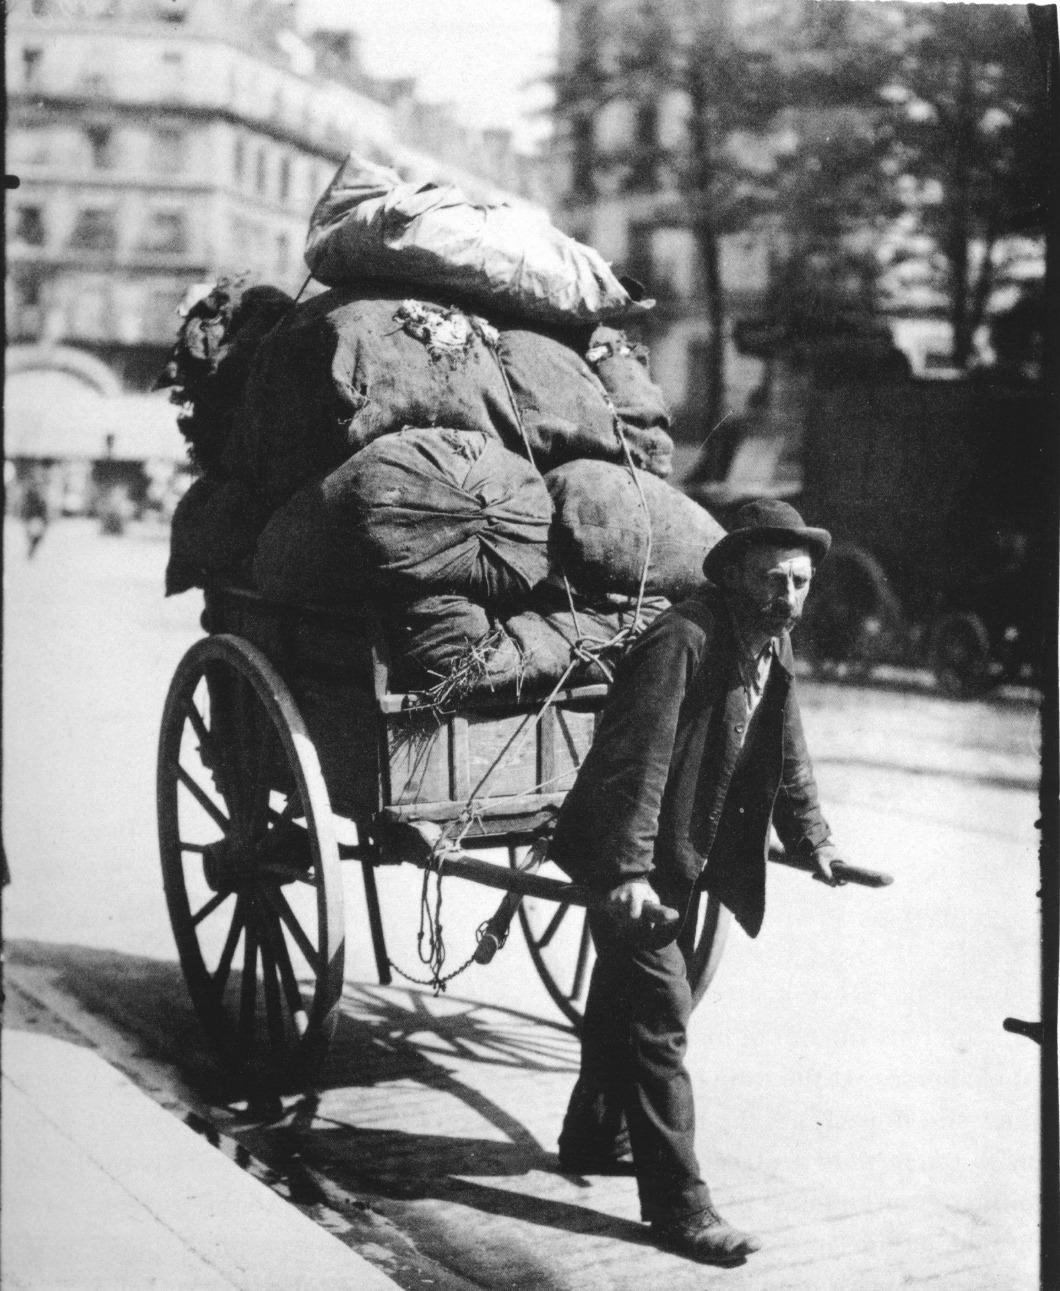 Ragpicker, avenue des Gobelins, 1901